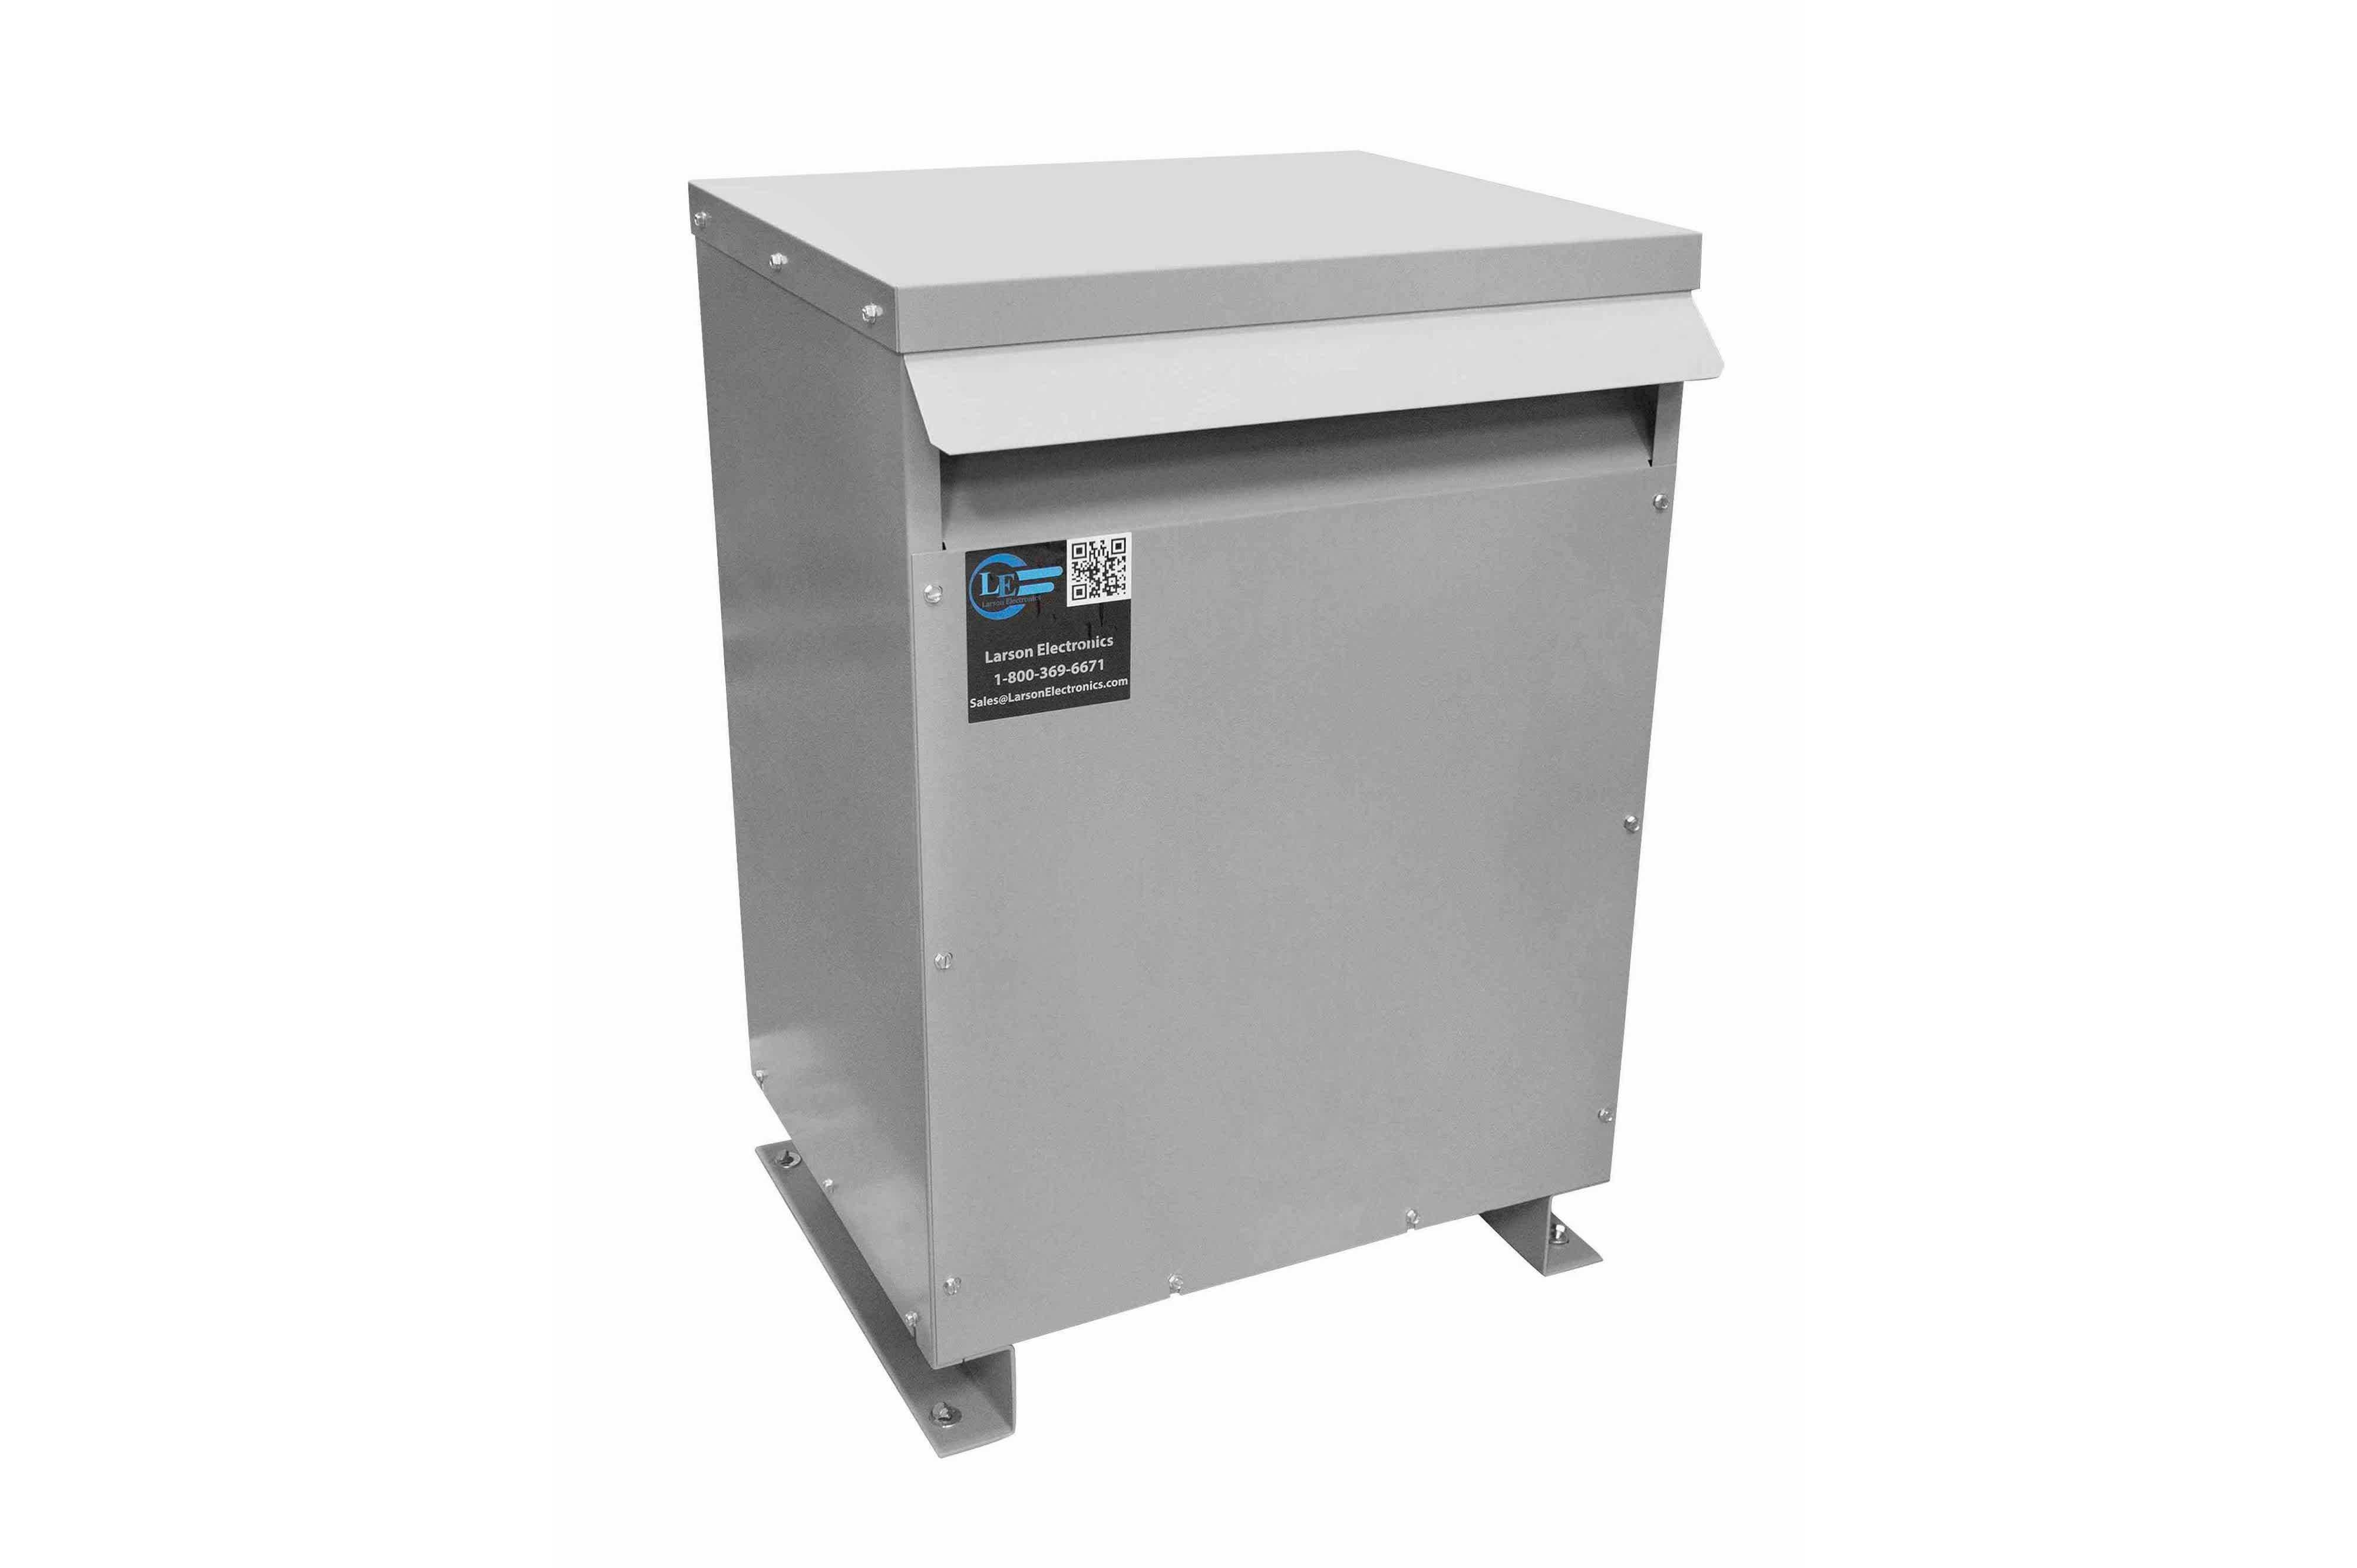 42.5 kVA 3PH Isolation Transformer, 480V Wye Primary, 400Y/231 Wye-N Secondary, N3R, Ventilated, 60 Hz